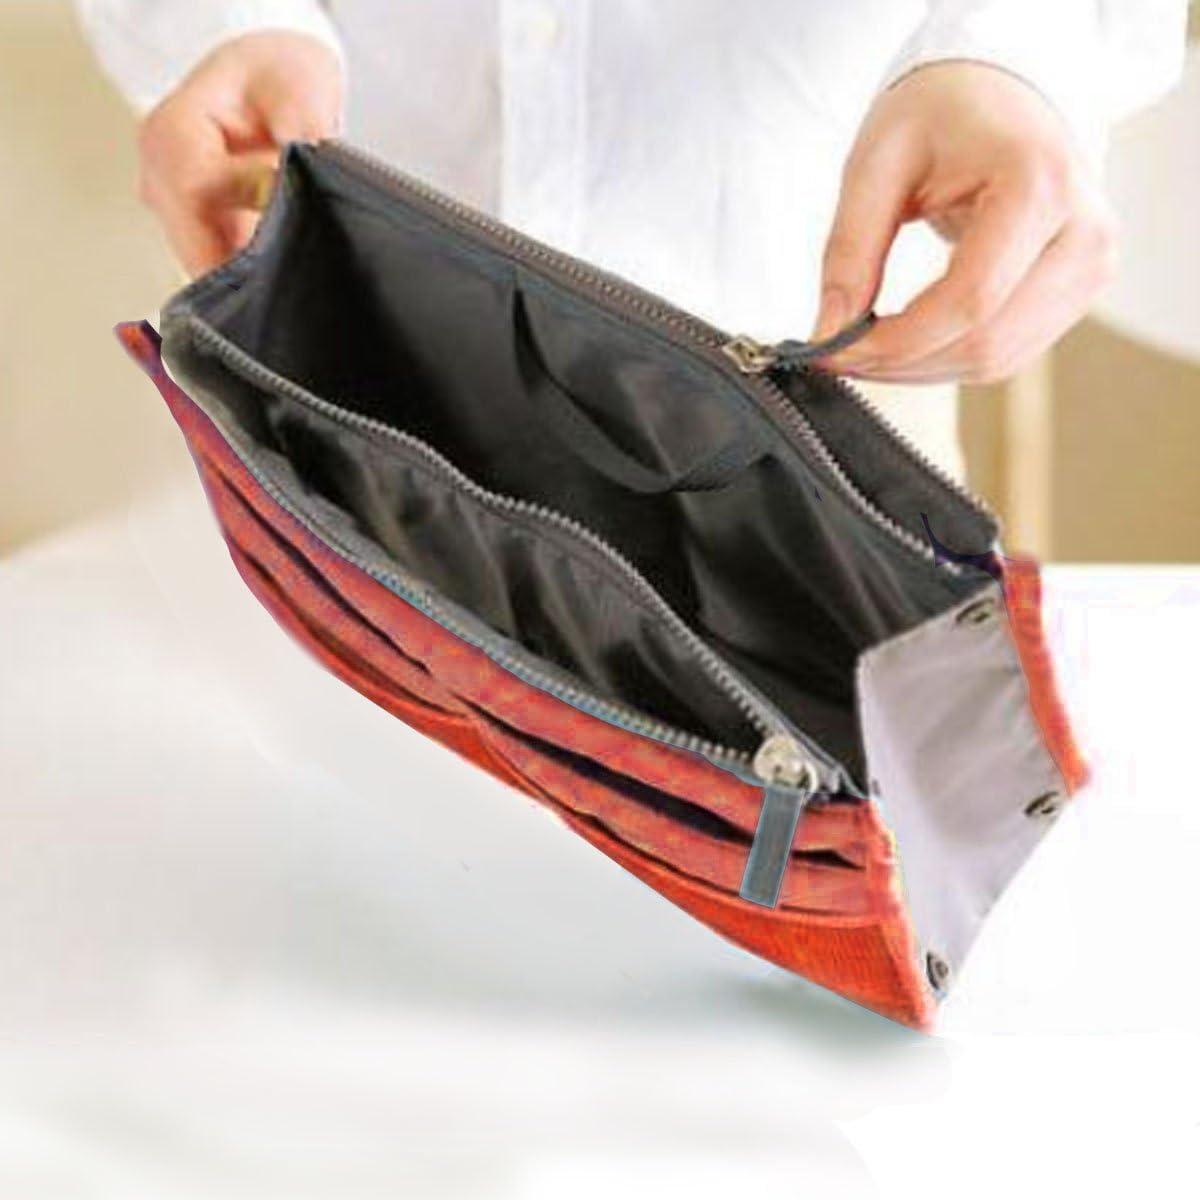 Expandable with Handles Dark Red Nylon Handbag Orangiser Tidy Travel Insert Comestic Gadget Purse Organizer Bag